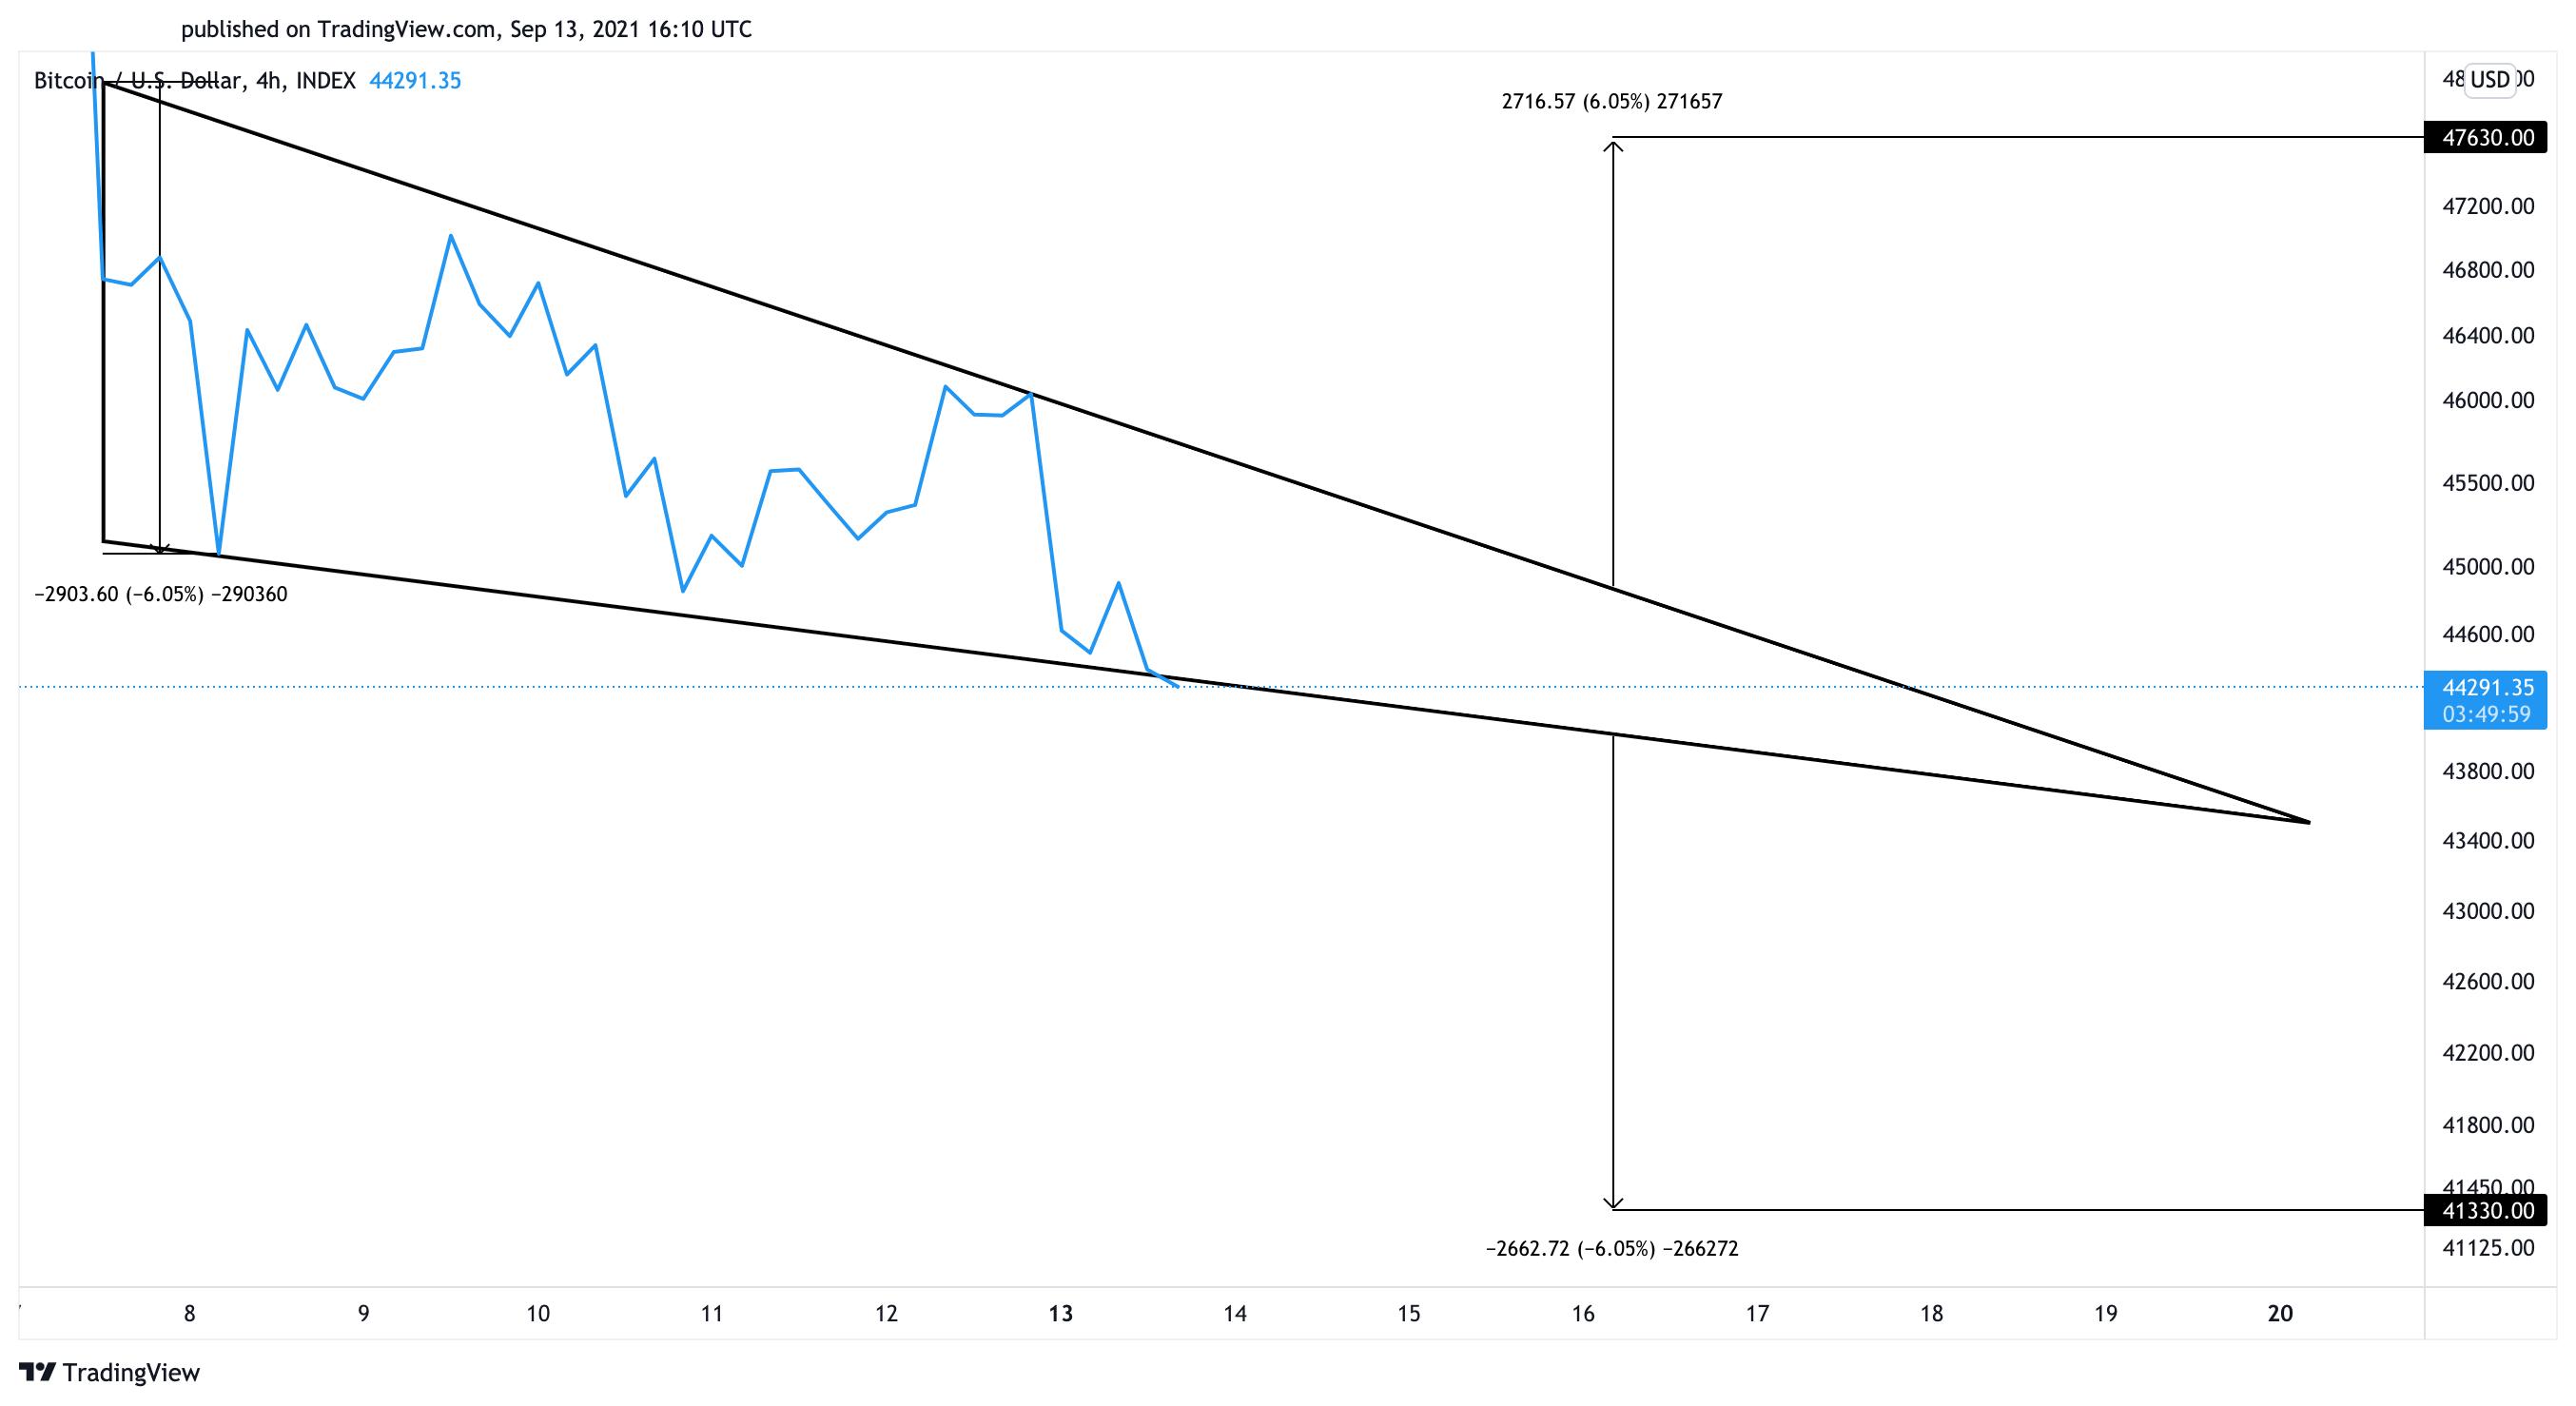 Gráfico de precios de Bitcoin en dólares estadounidenses